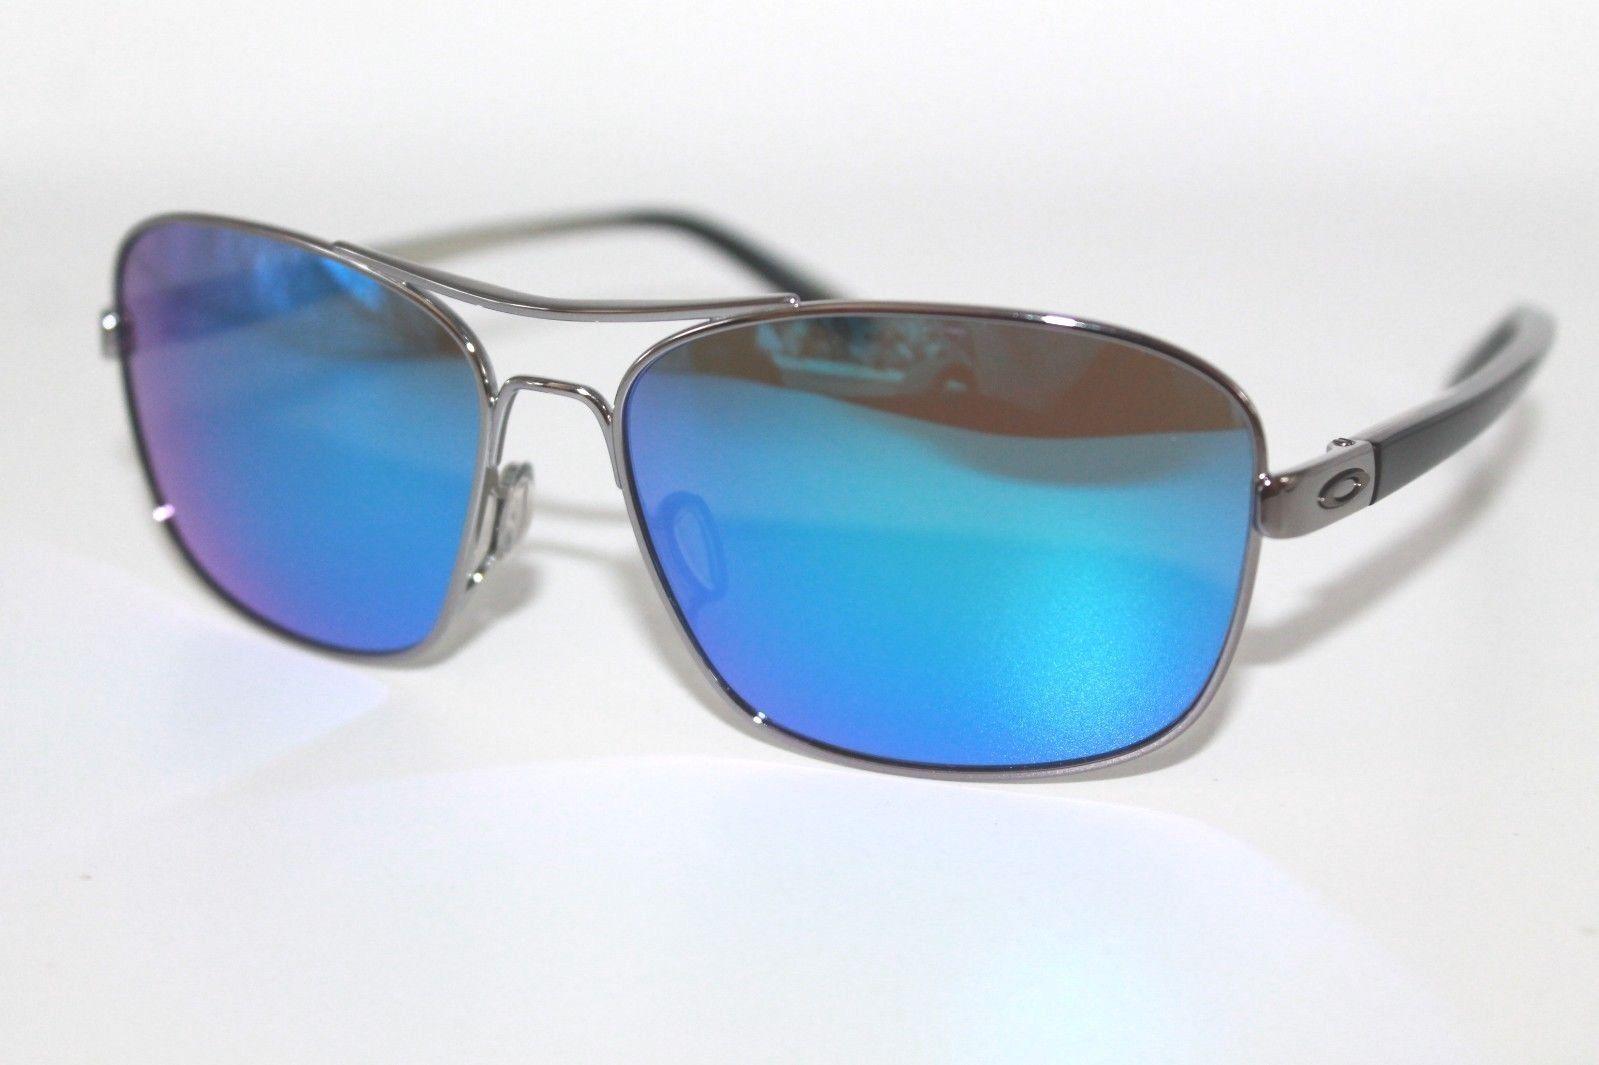 5a56e9311ee Oakley Sanctuary Sunglasses OO4116-08 and 19 similar items. 57